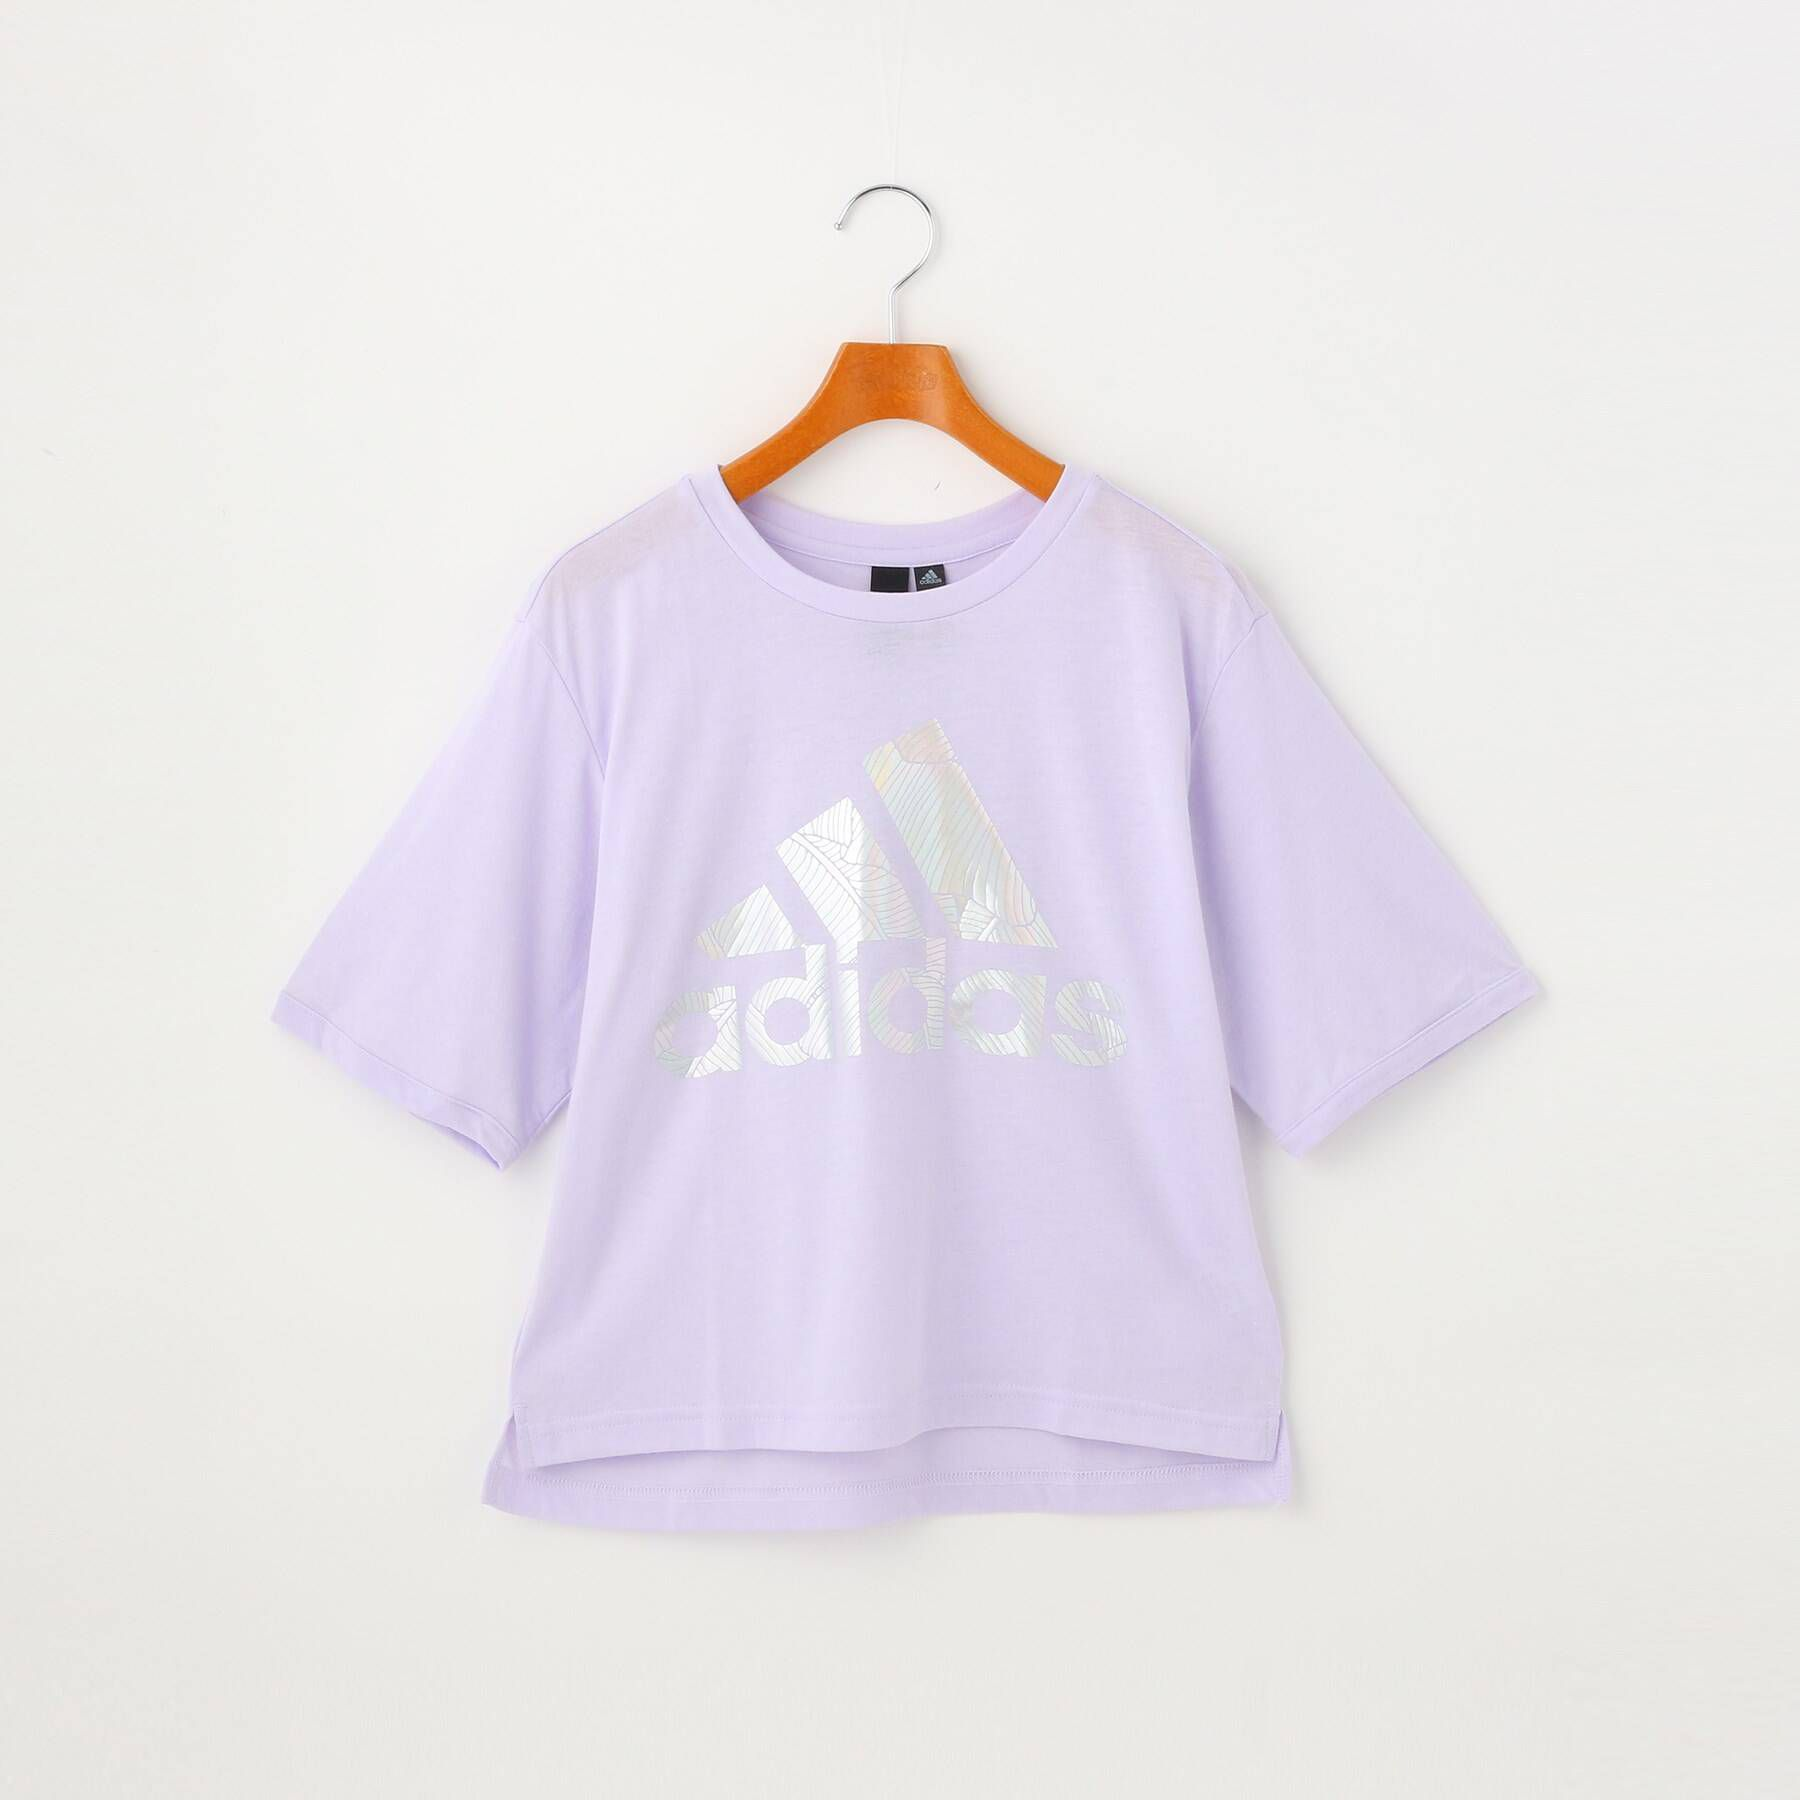 PINK-latte(ピンクラテ)/ メタリックロゴTシャツ